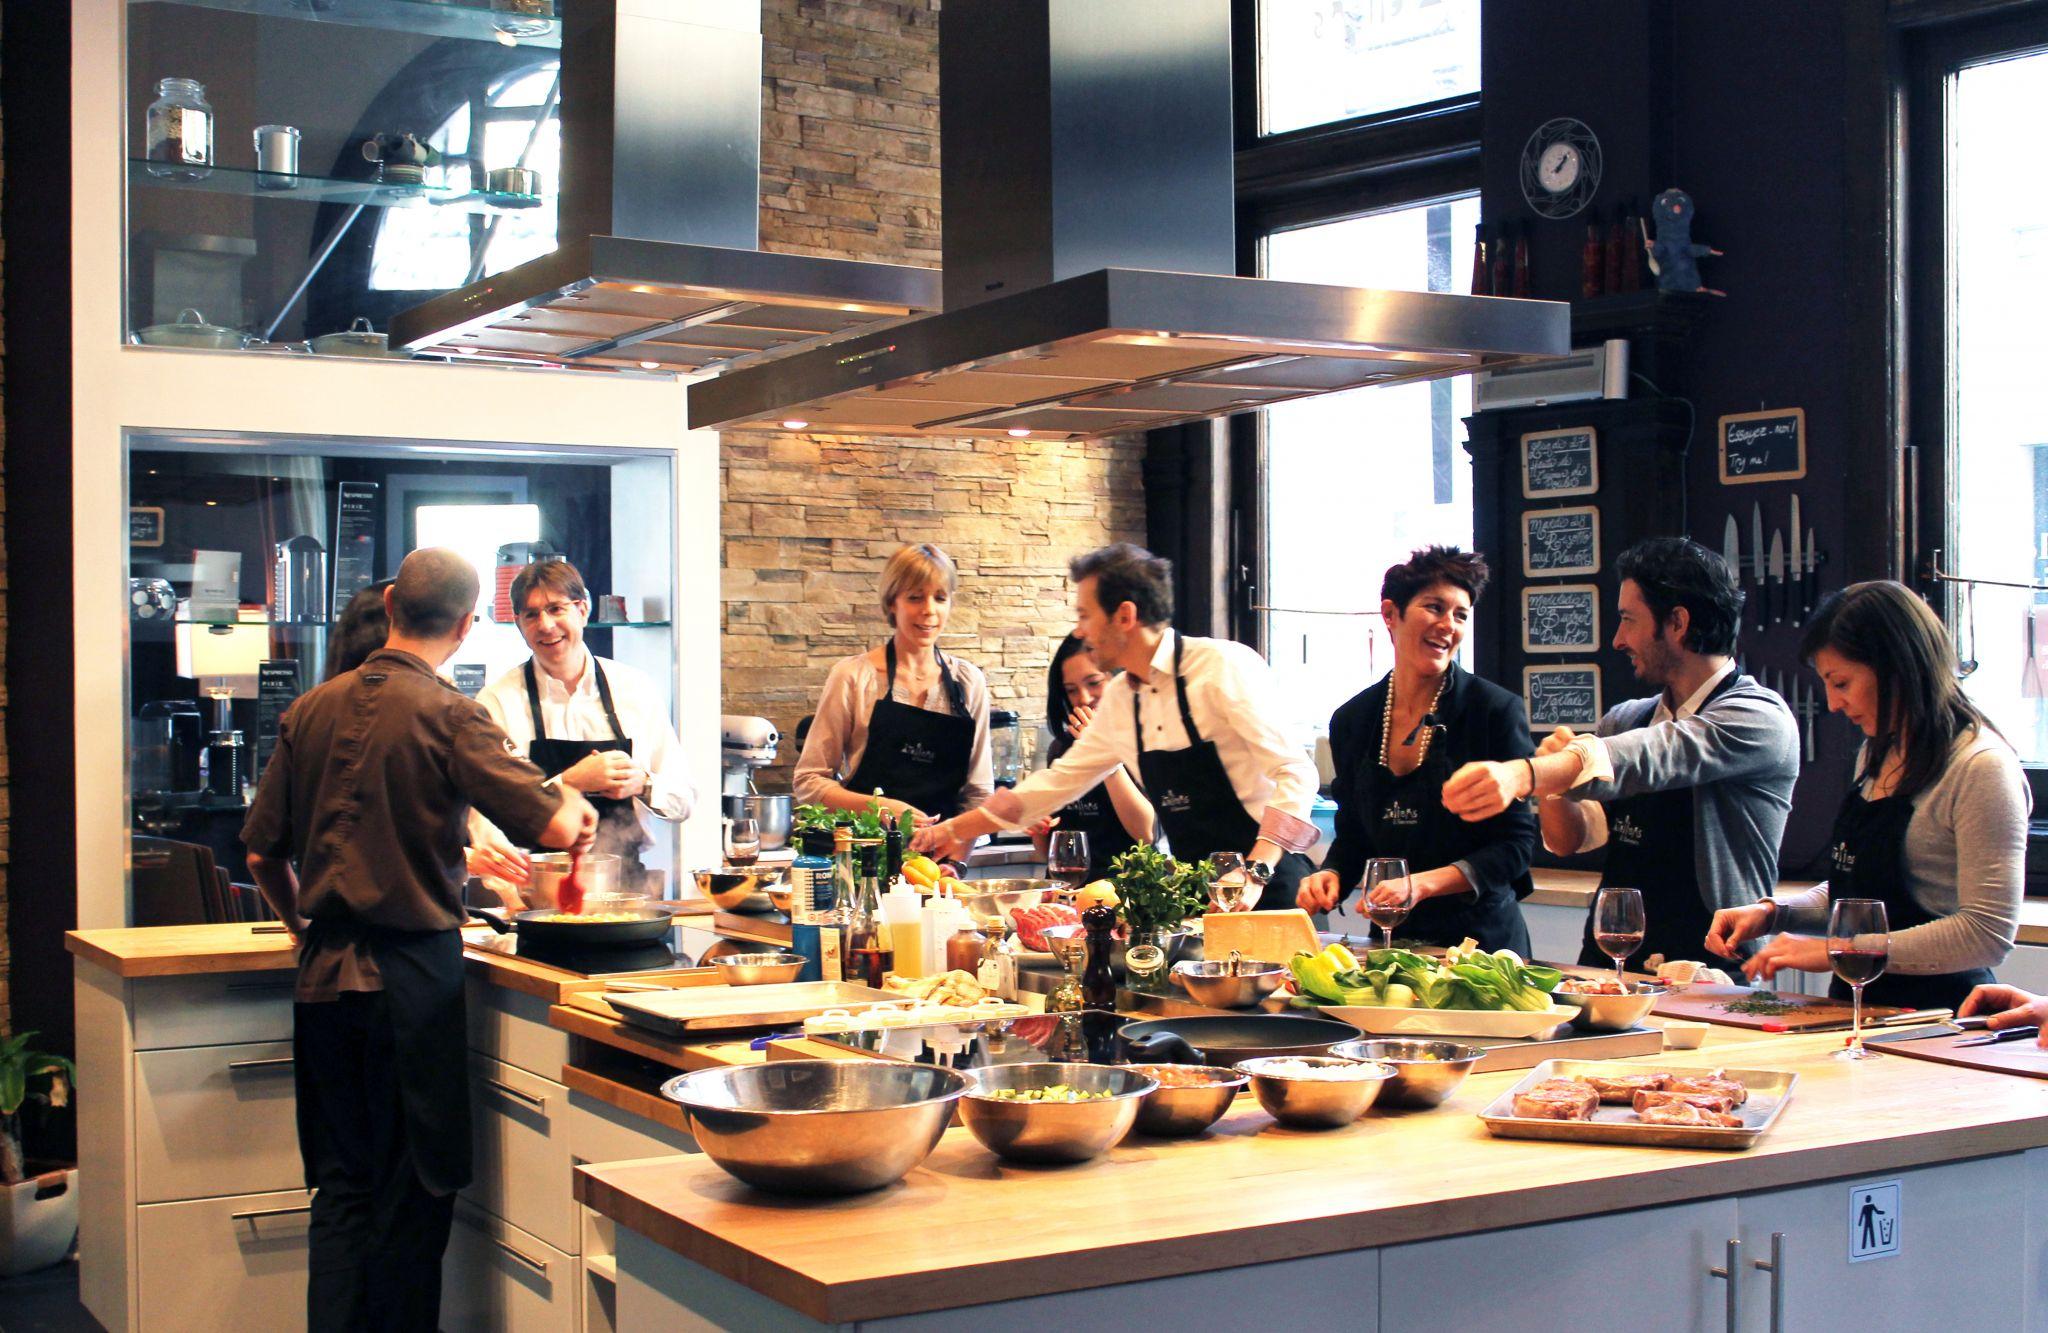 Challenge culinaire, un team building original